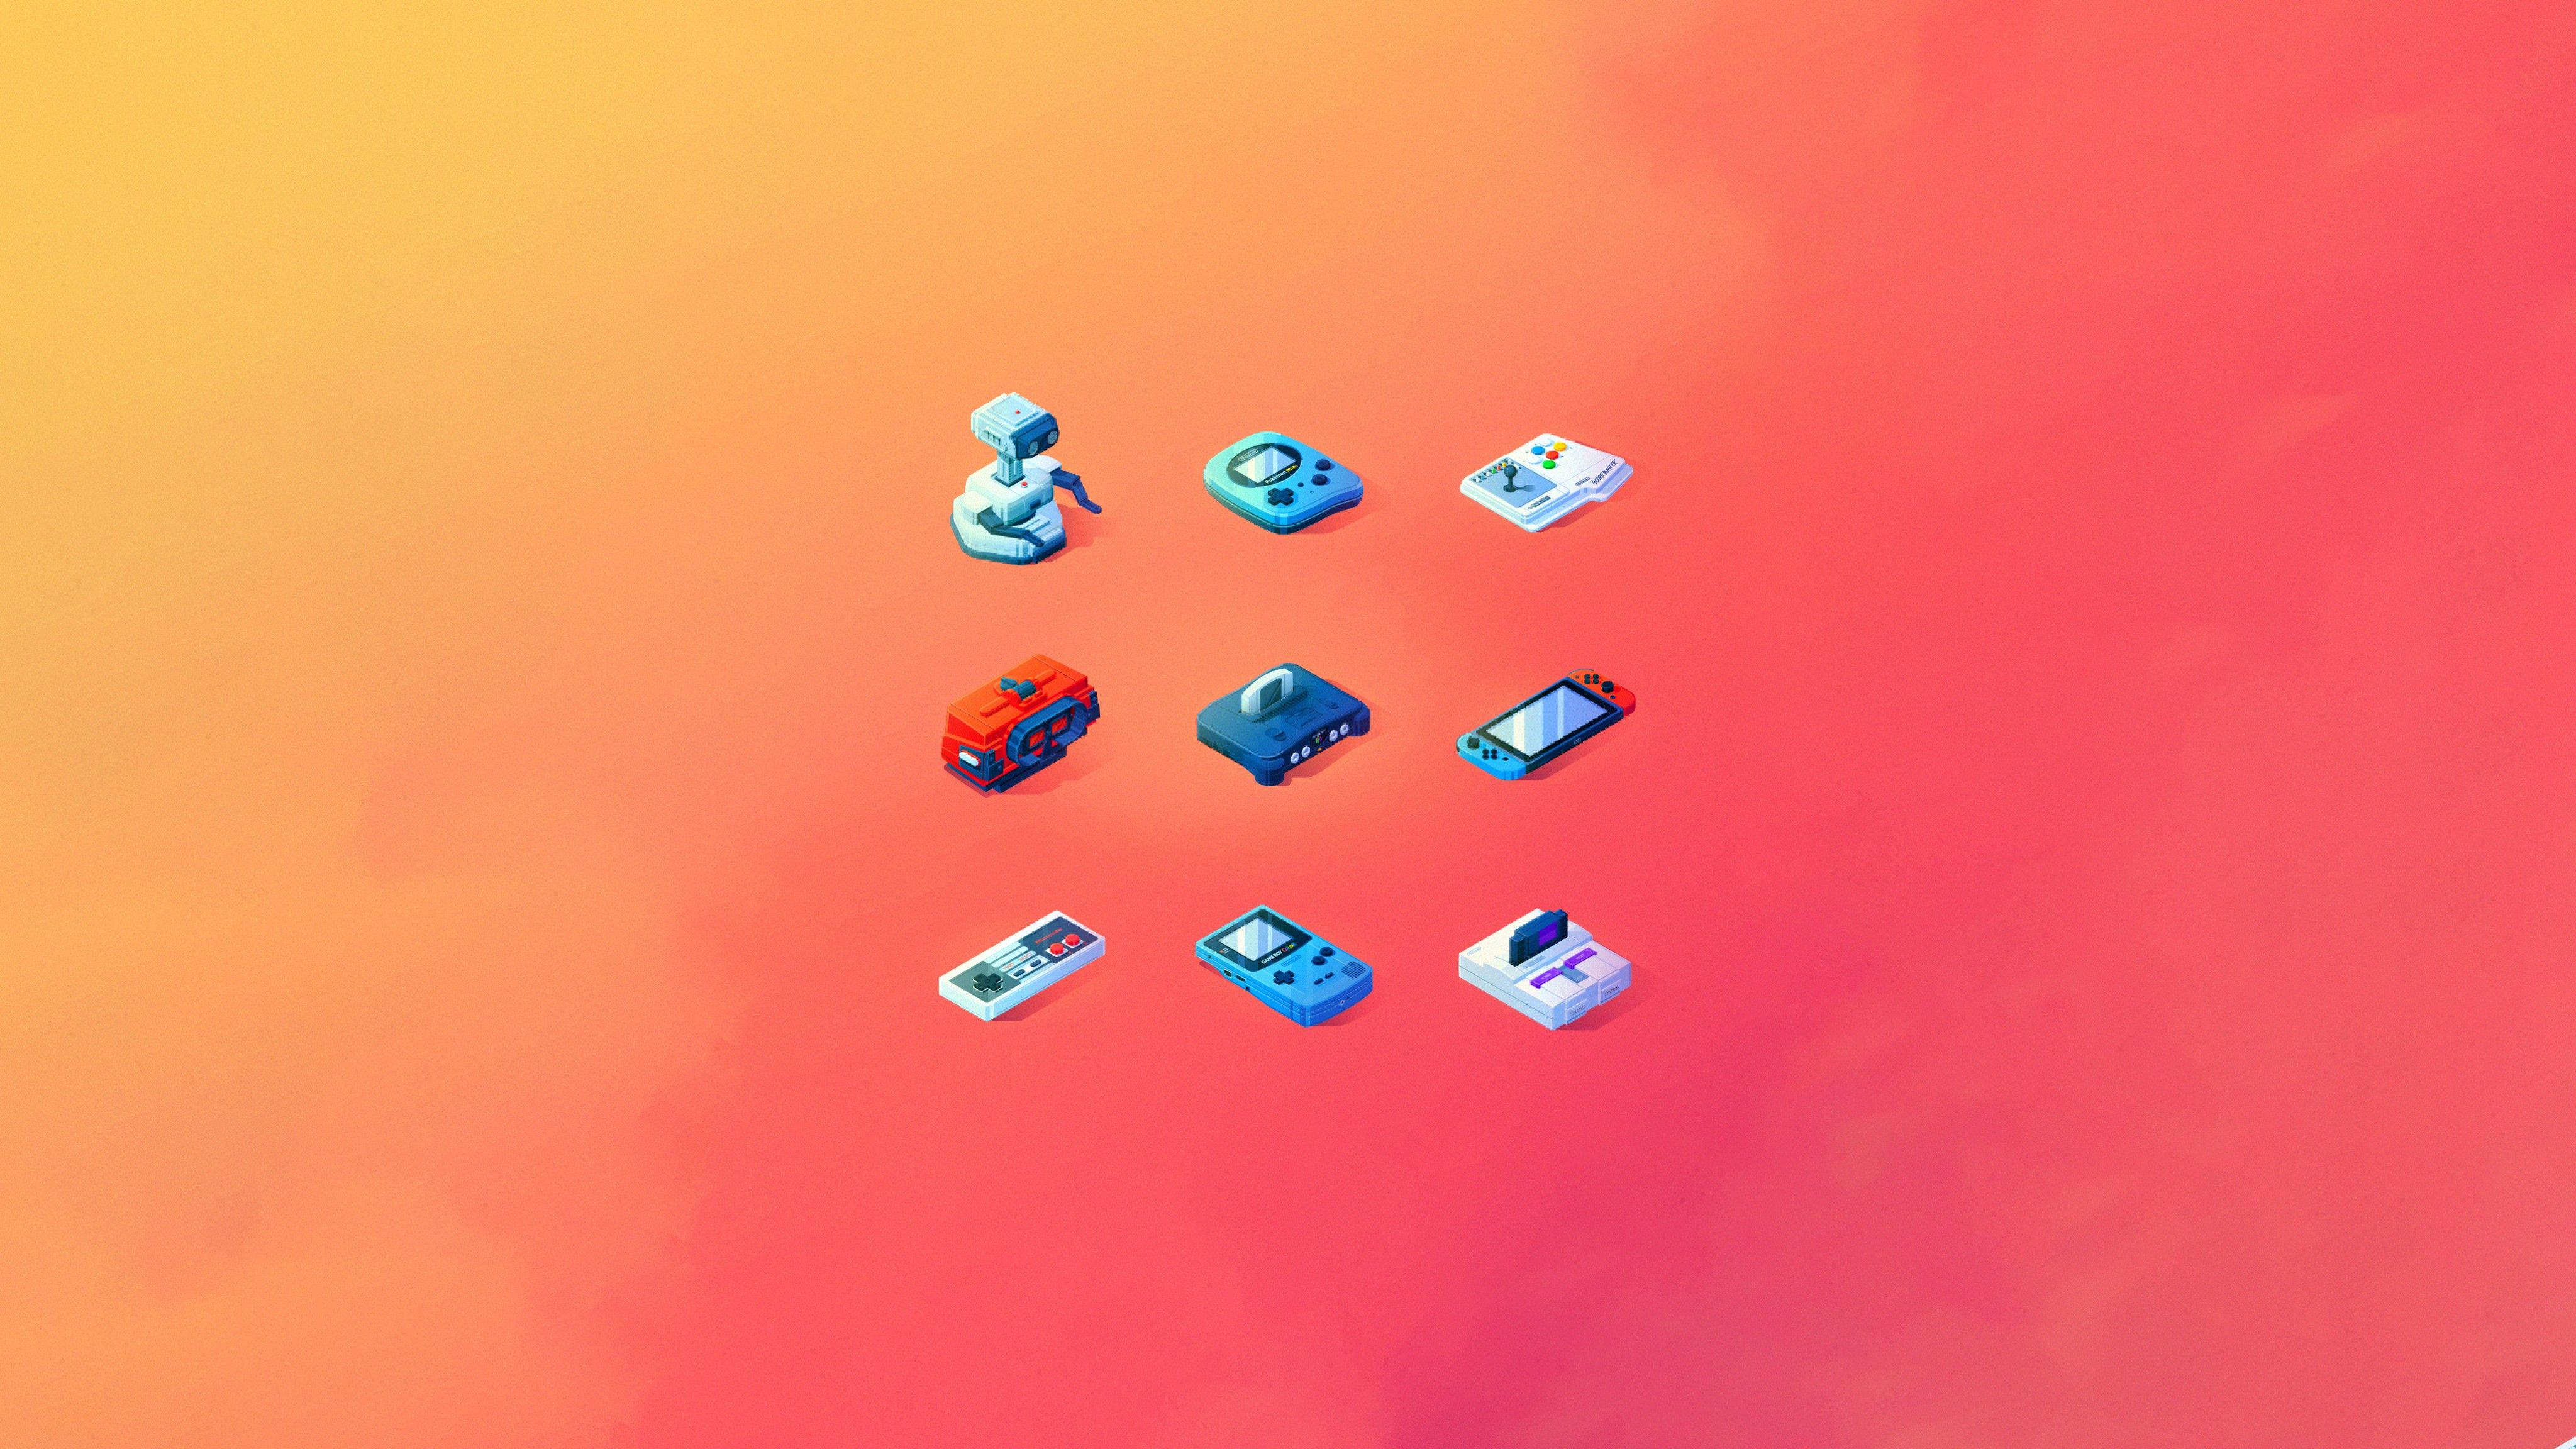 Nintendo Switch 4K Phone Wallpapers - Top Free Nintendo ...